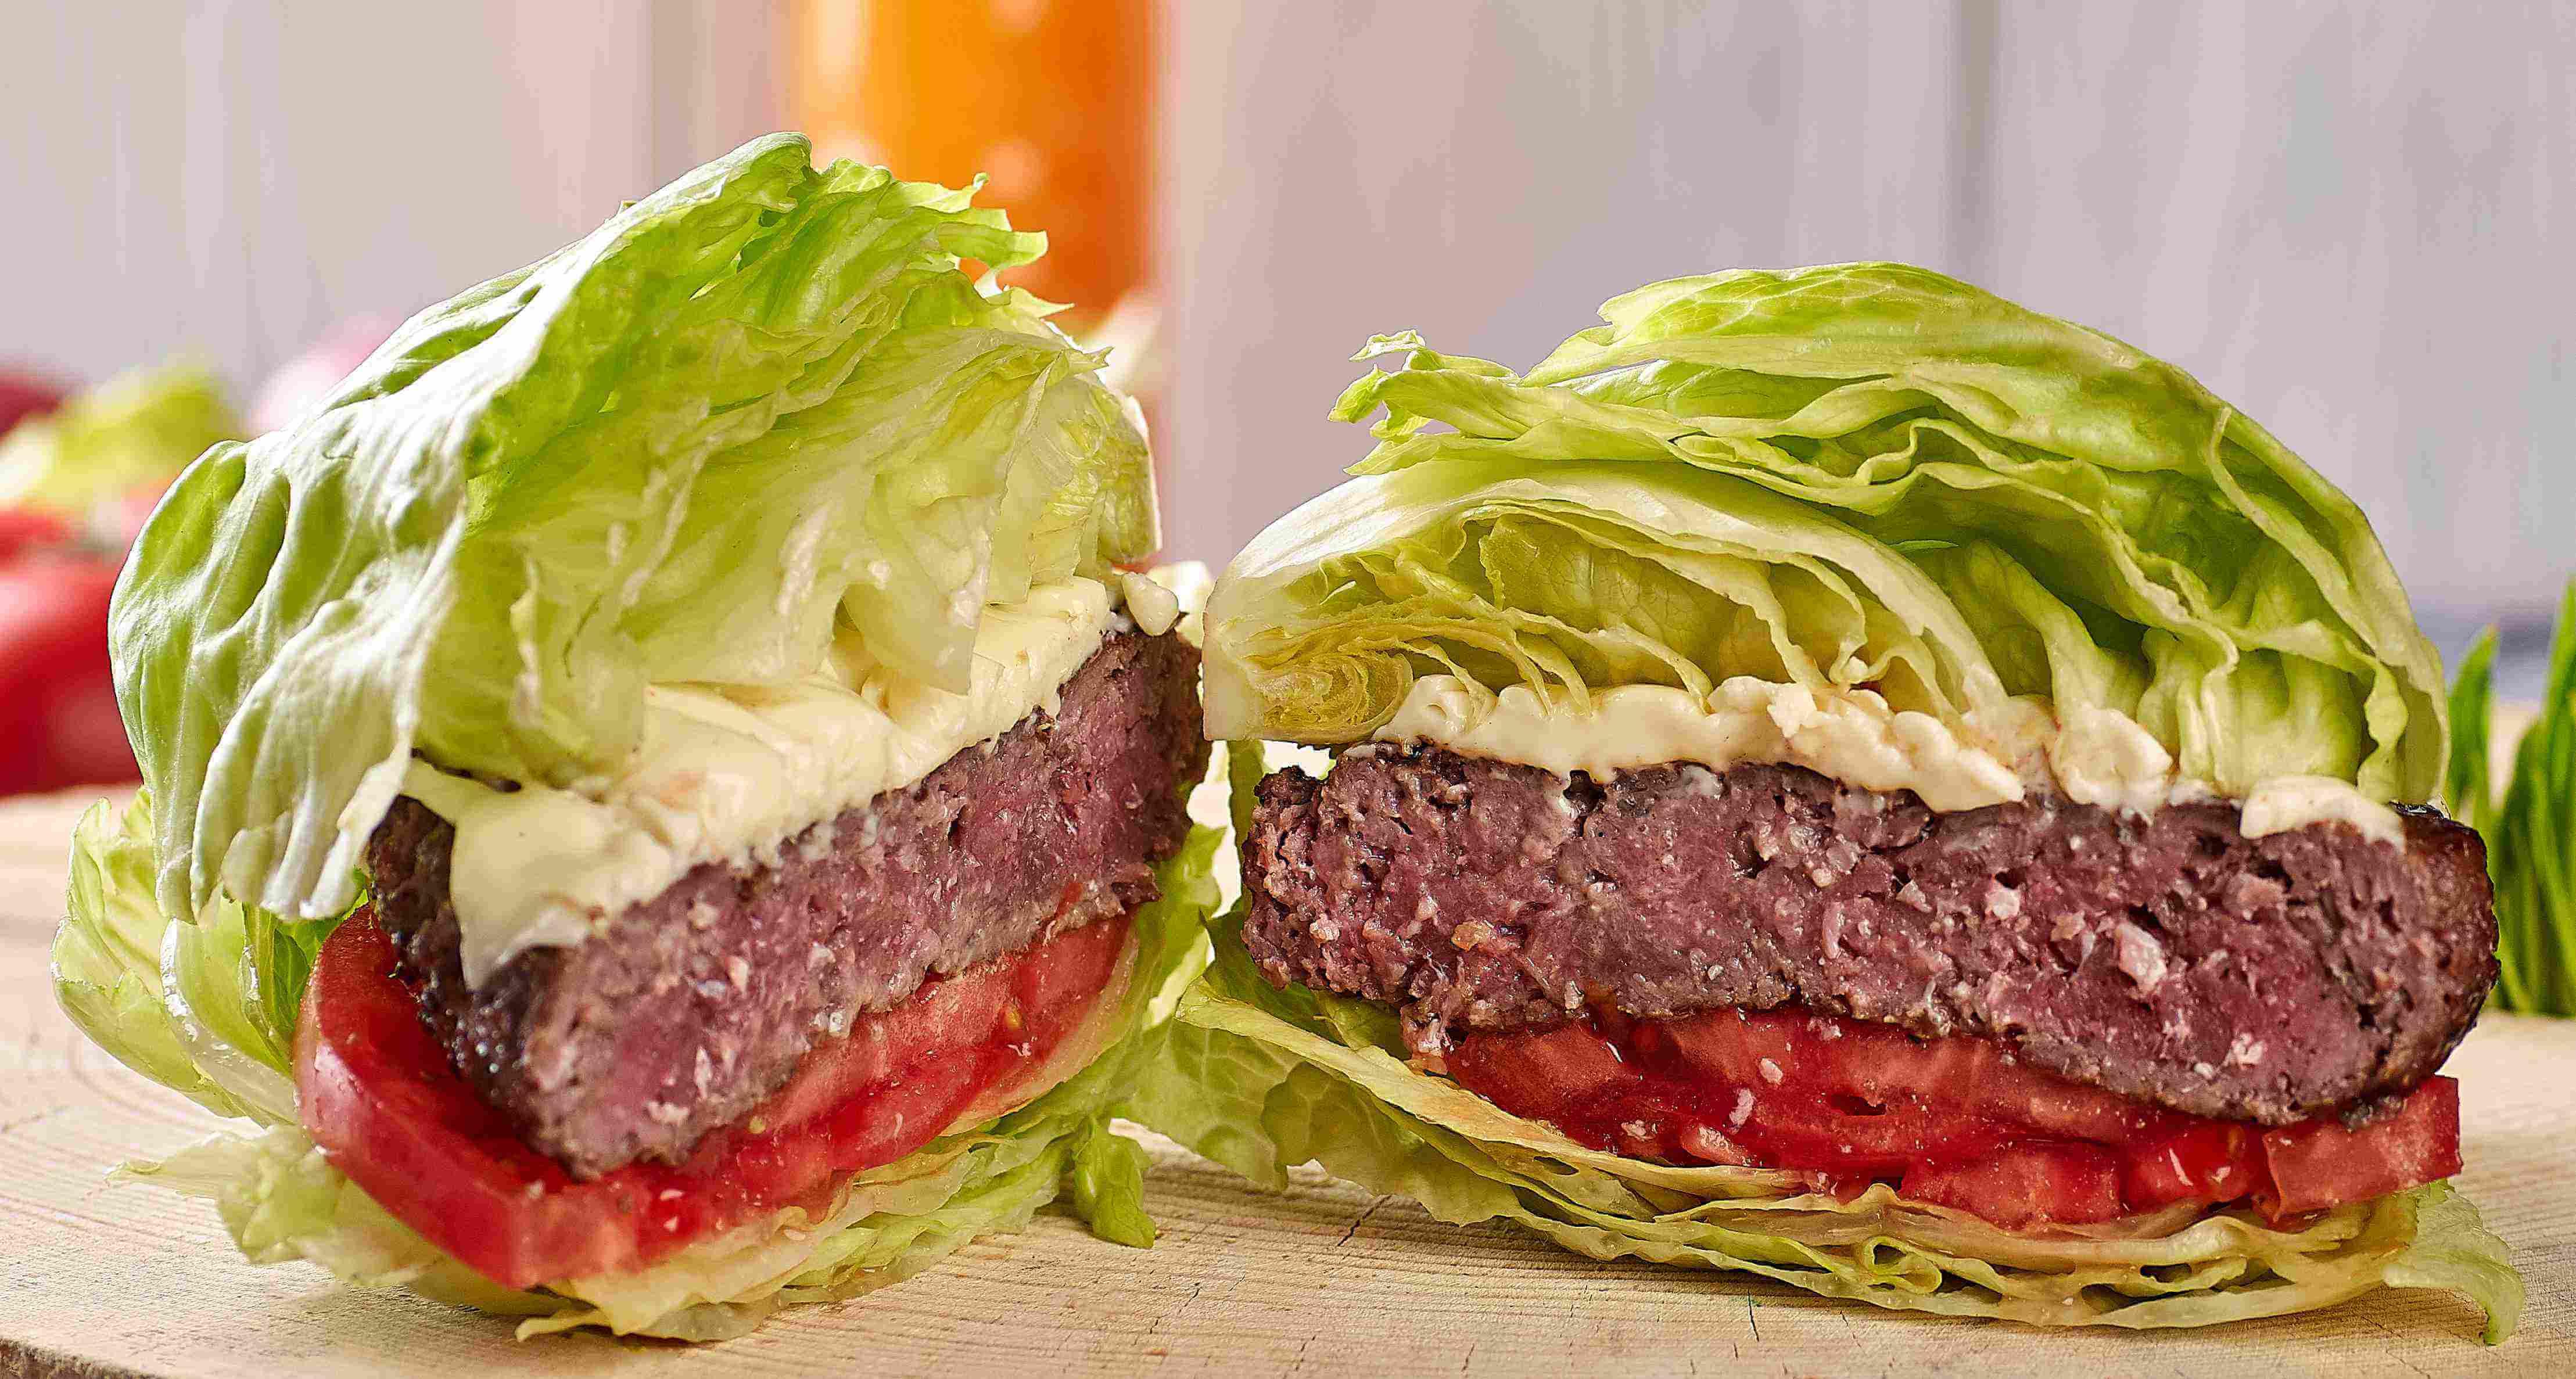 Hamburger with lettuce wrap